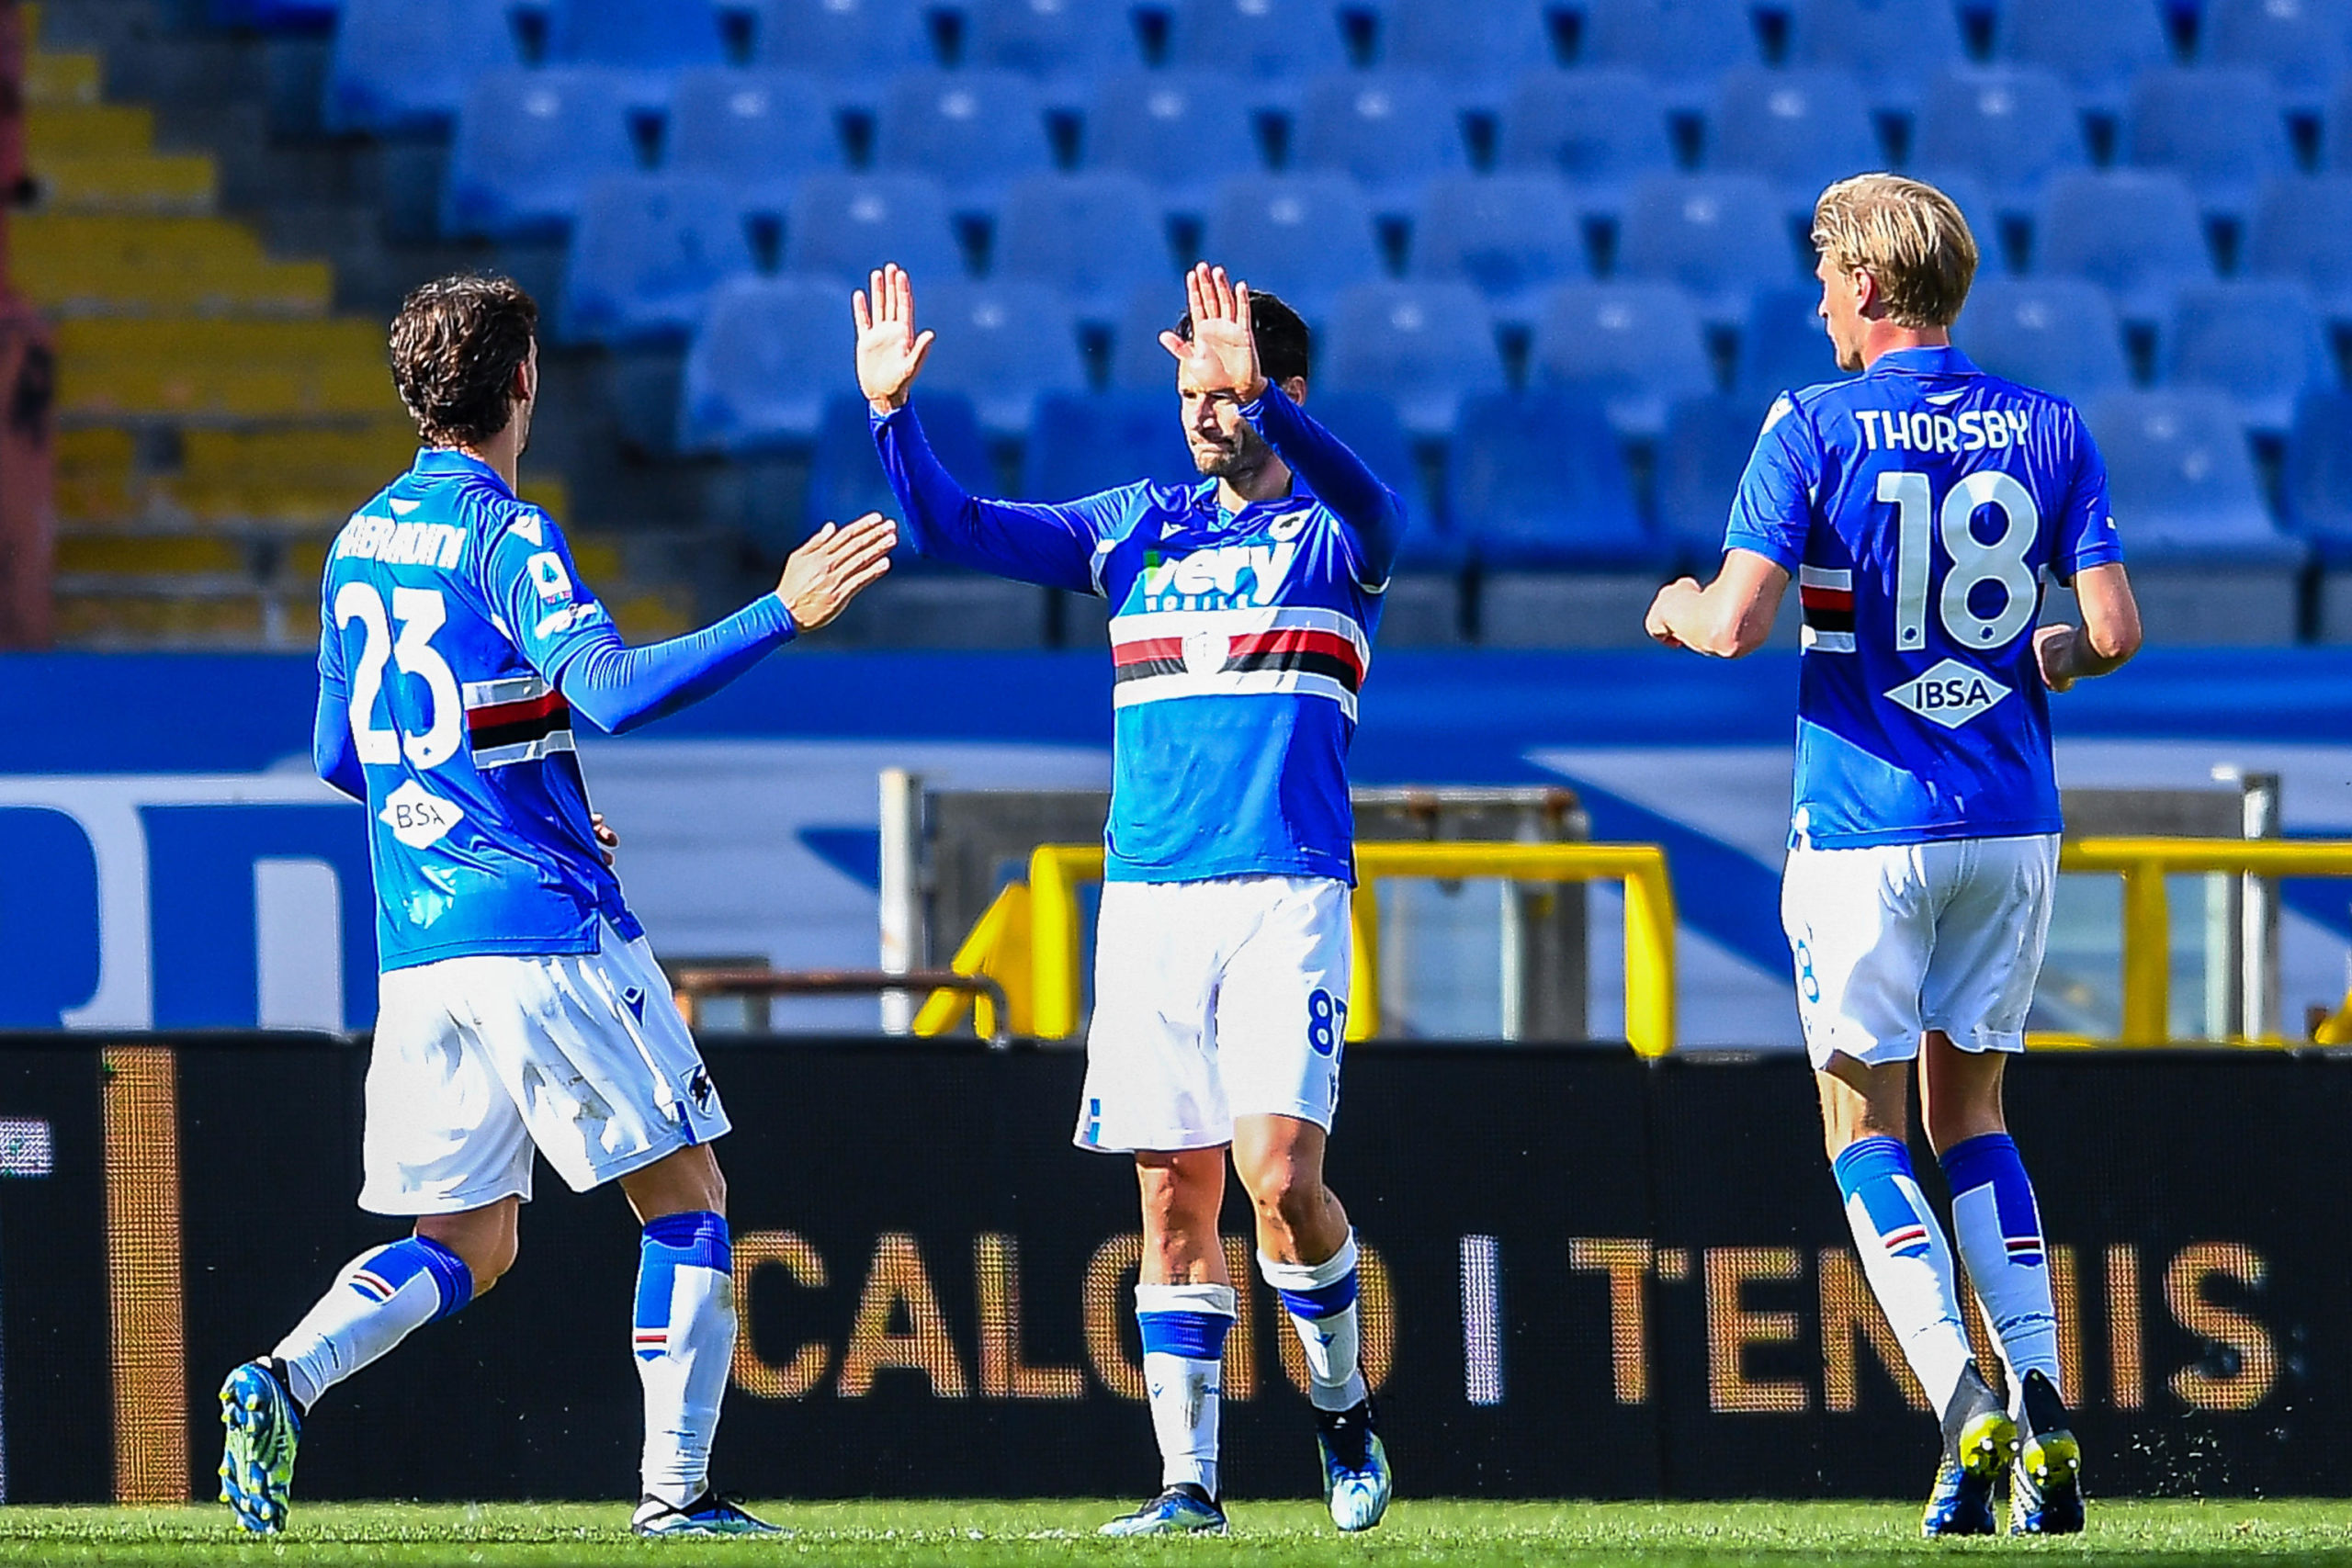 Sampdoria's Antonio Candreva celebrates a goal against Torino